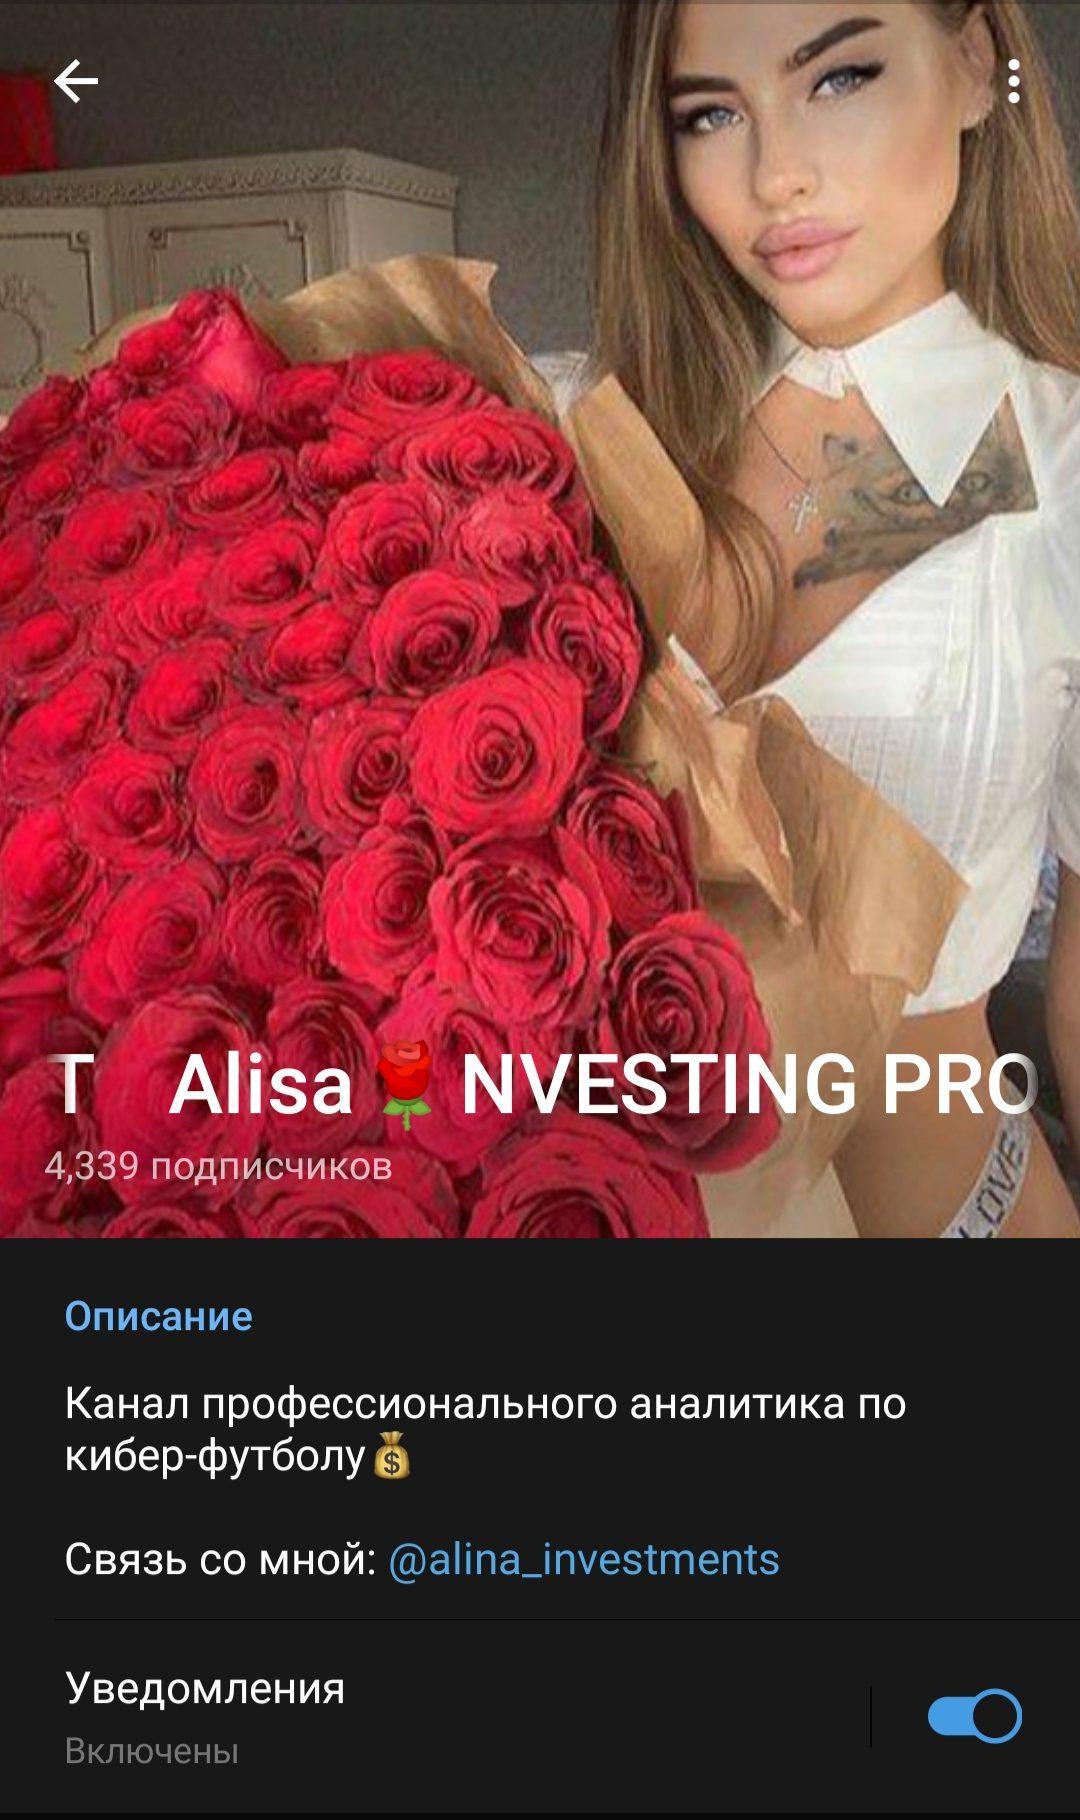 Телеграмм Alisa Investing Project